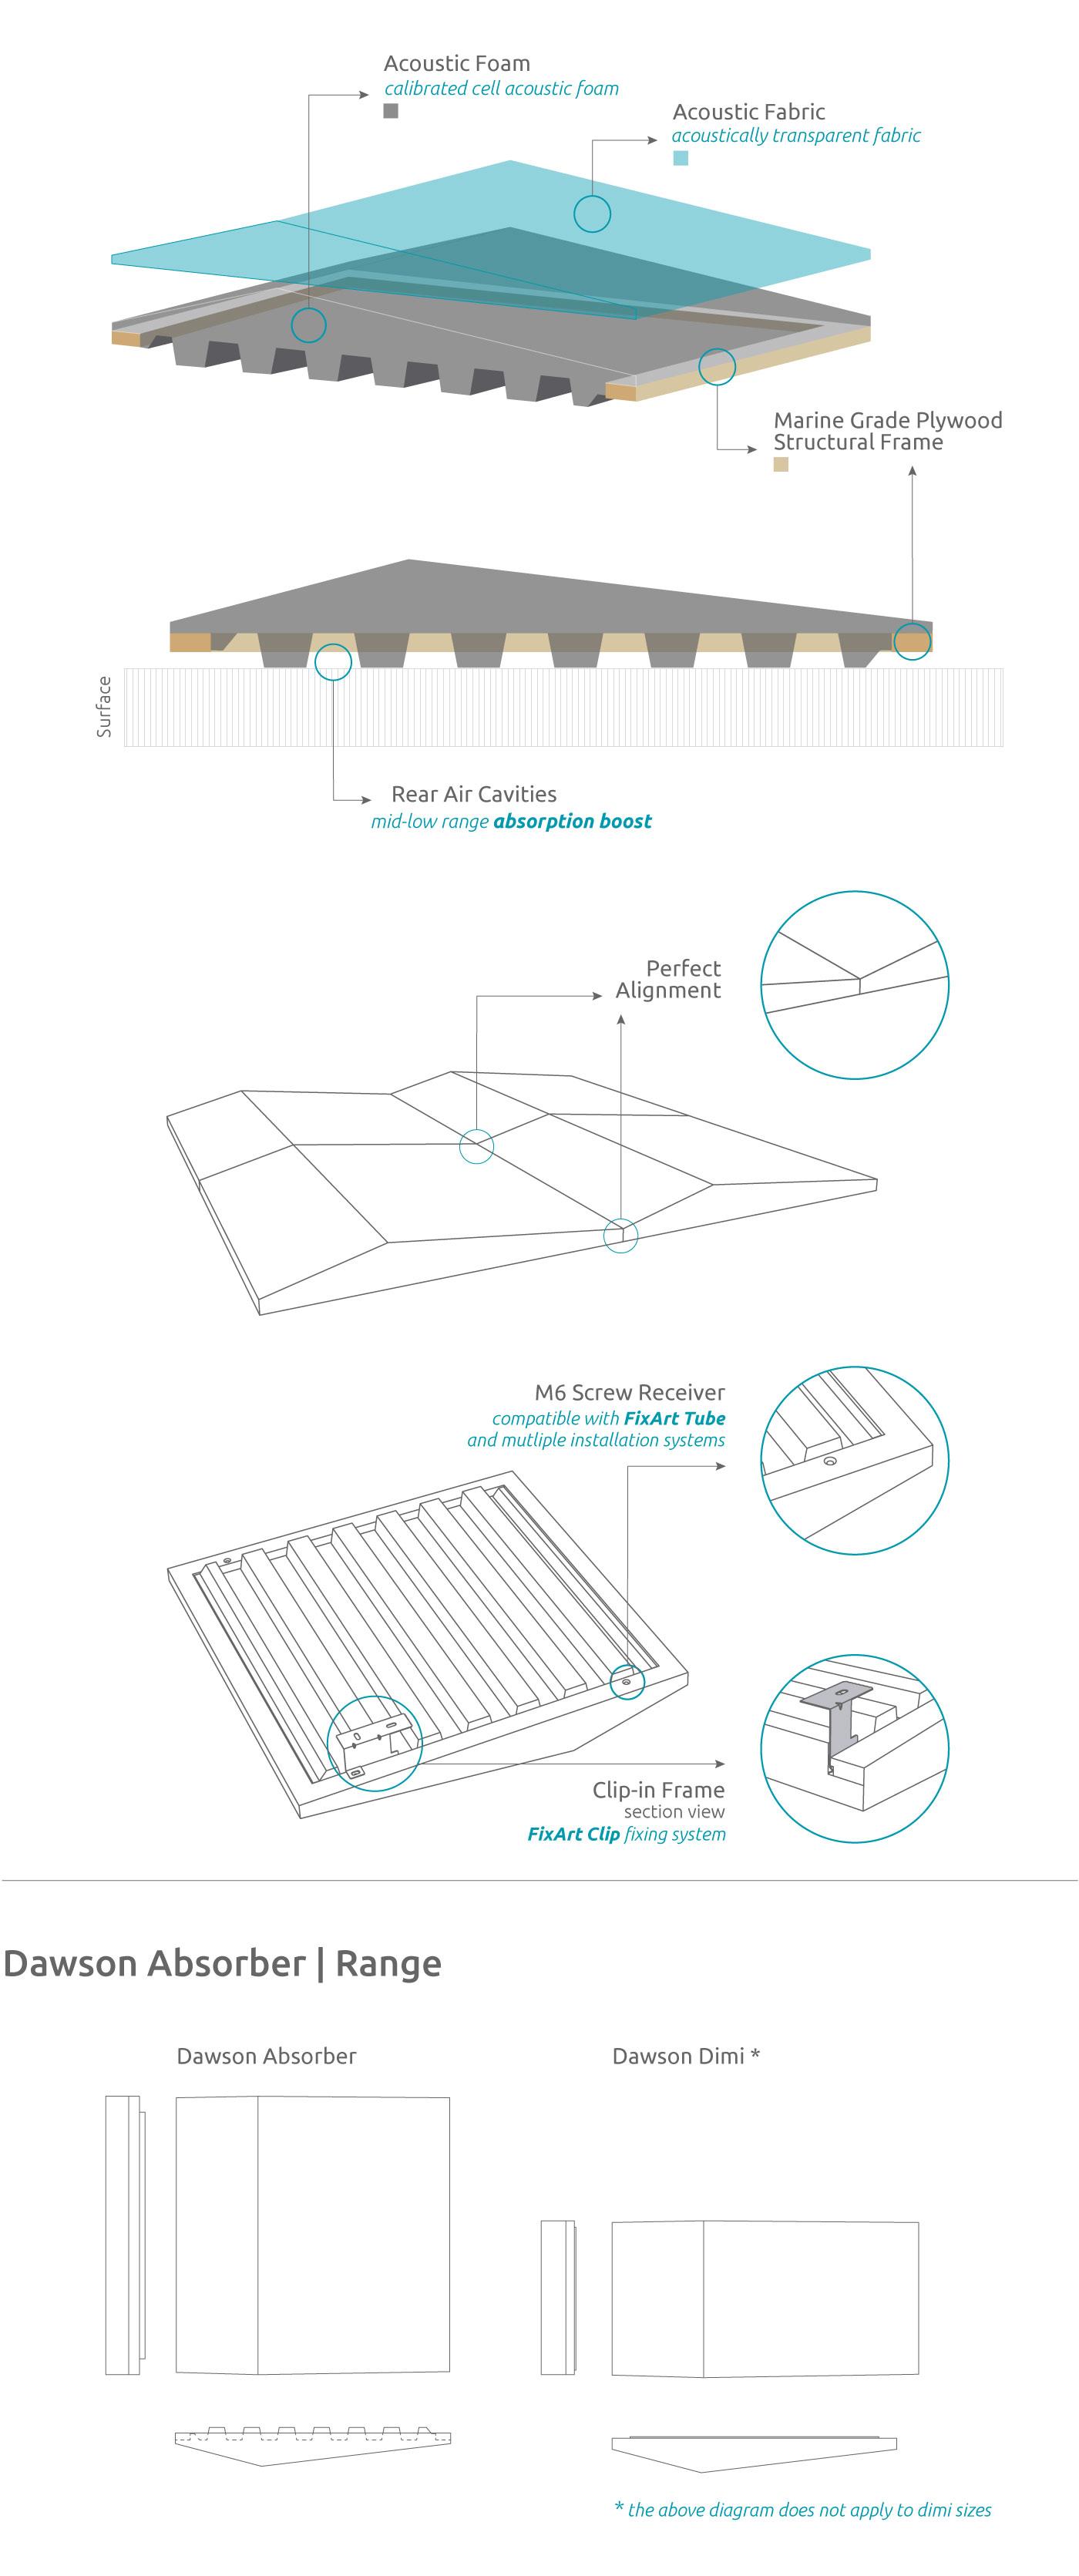 Artnovion product dawson absorber a7dc675cbc